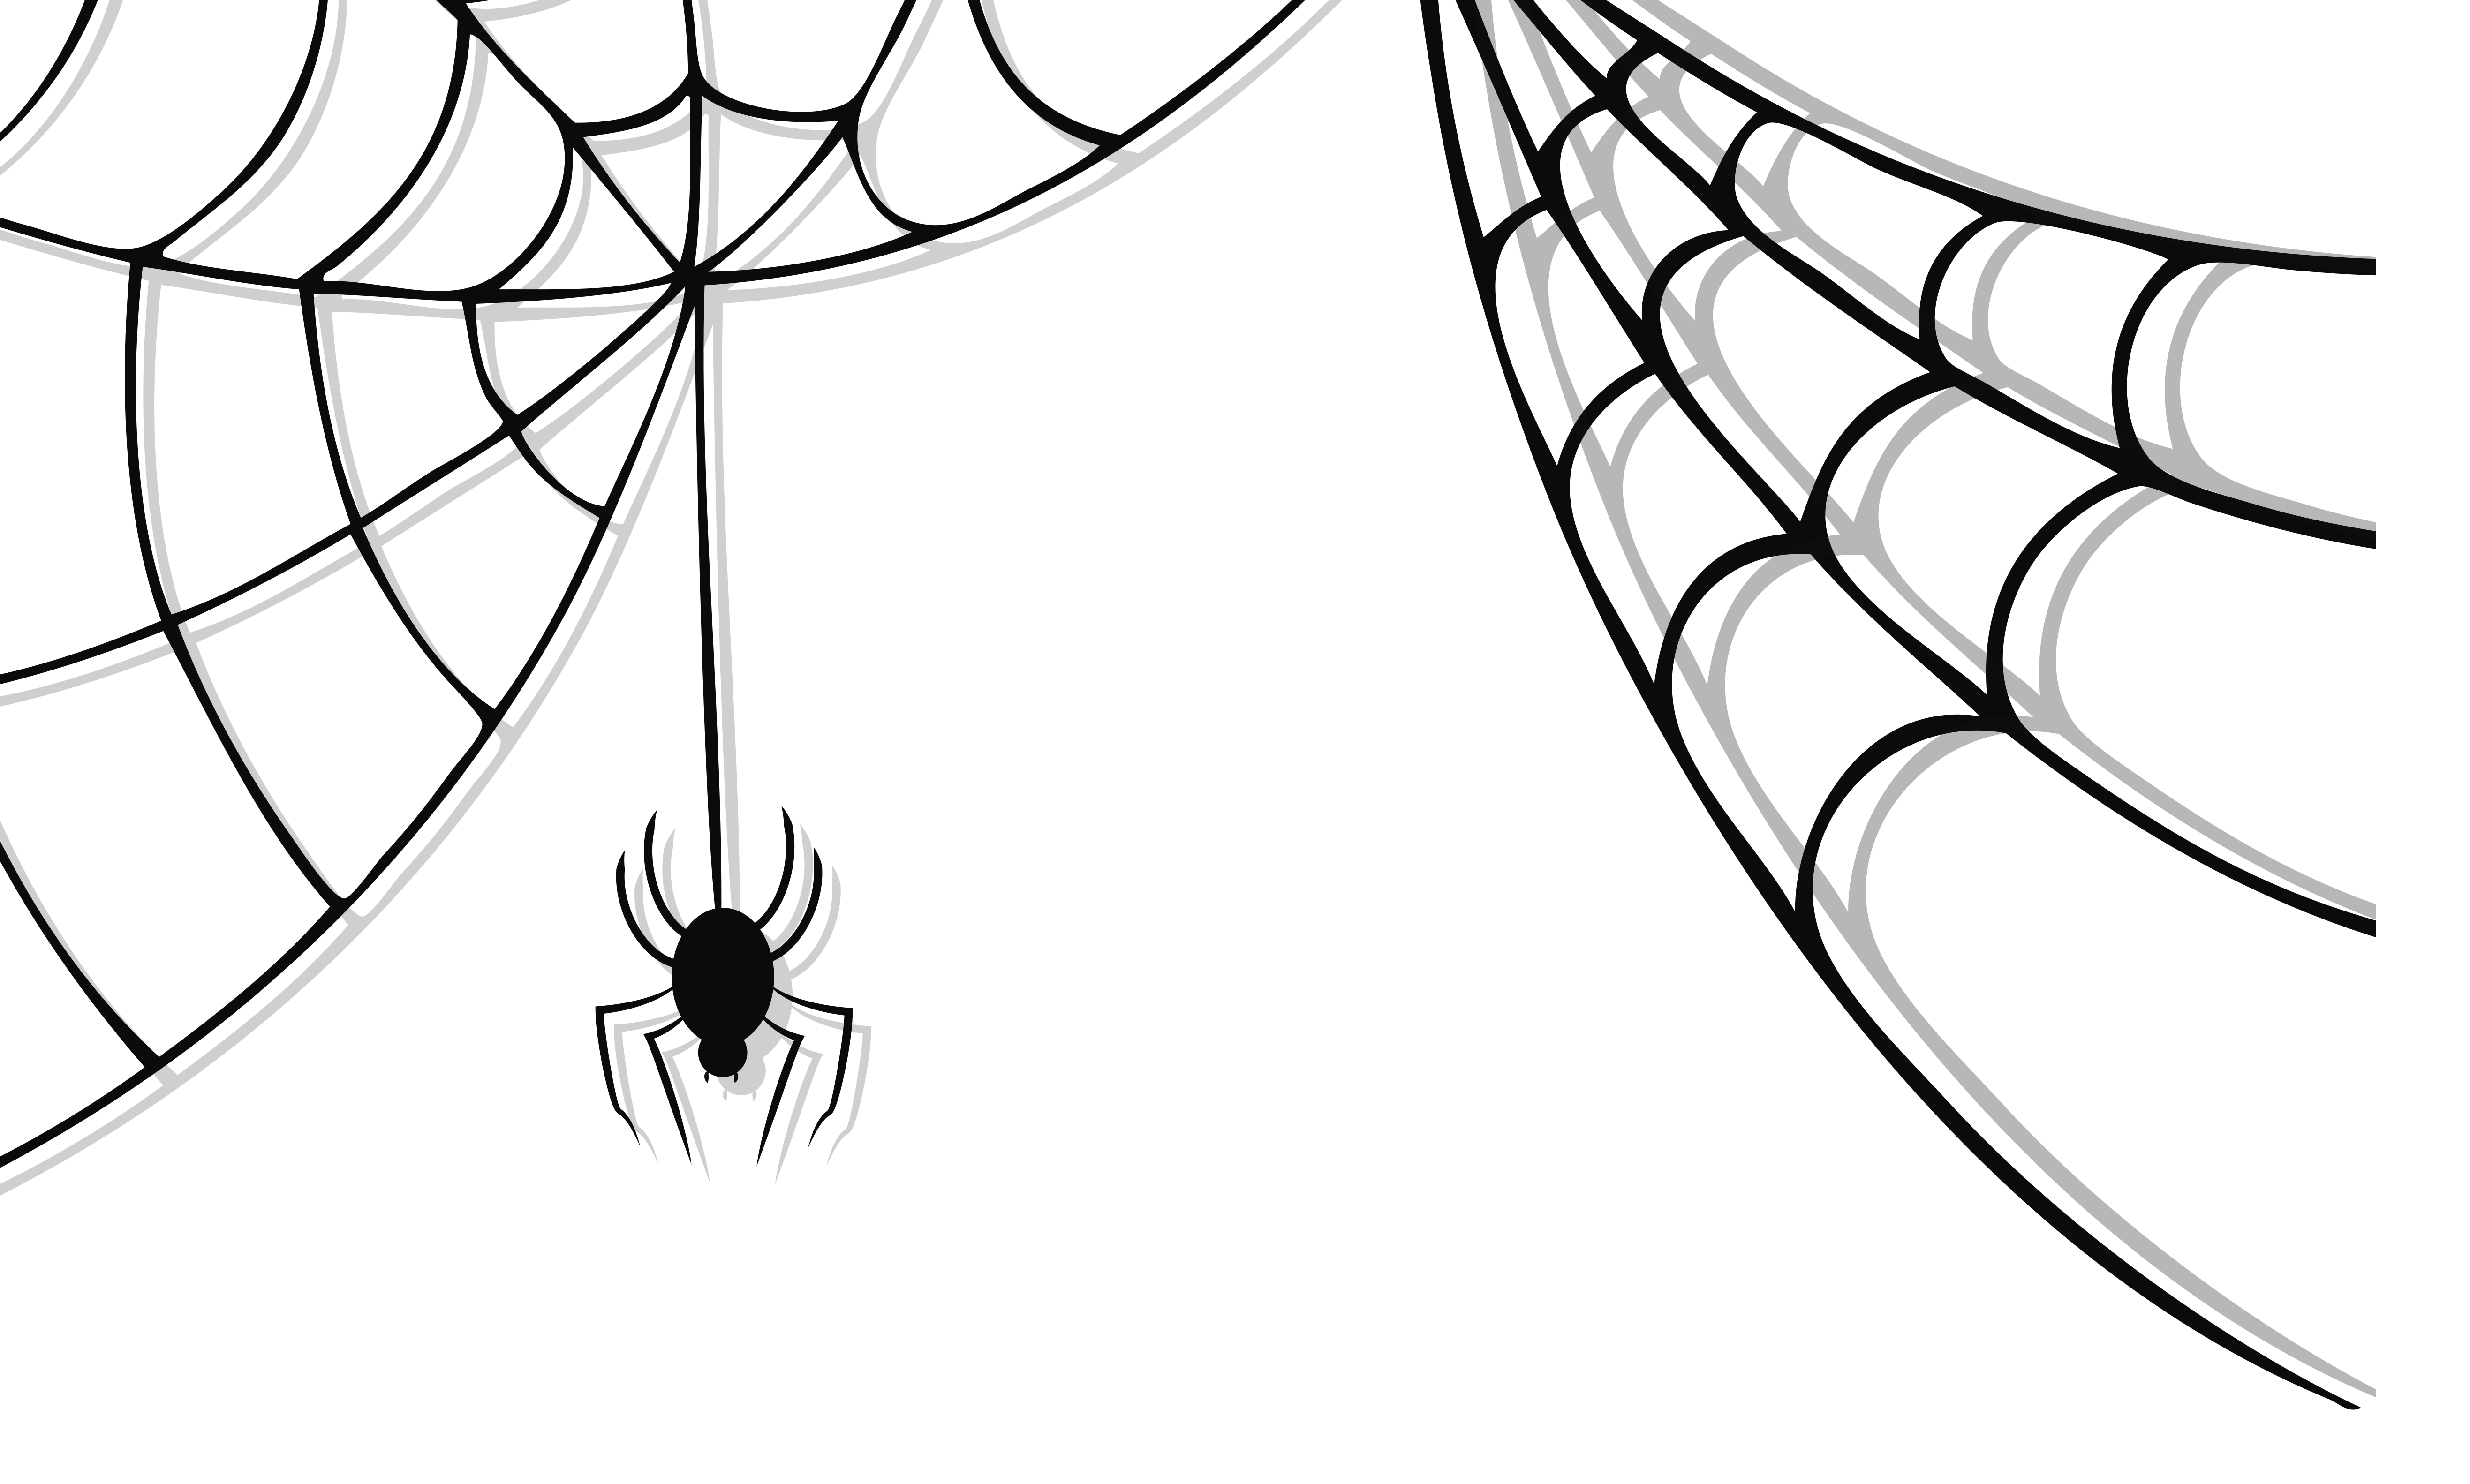 Spider Web Border